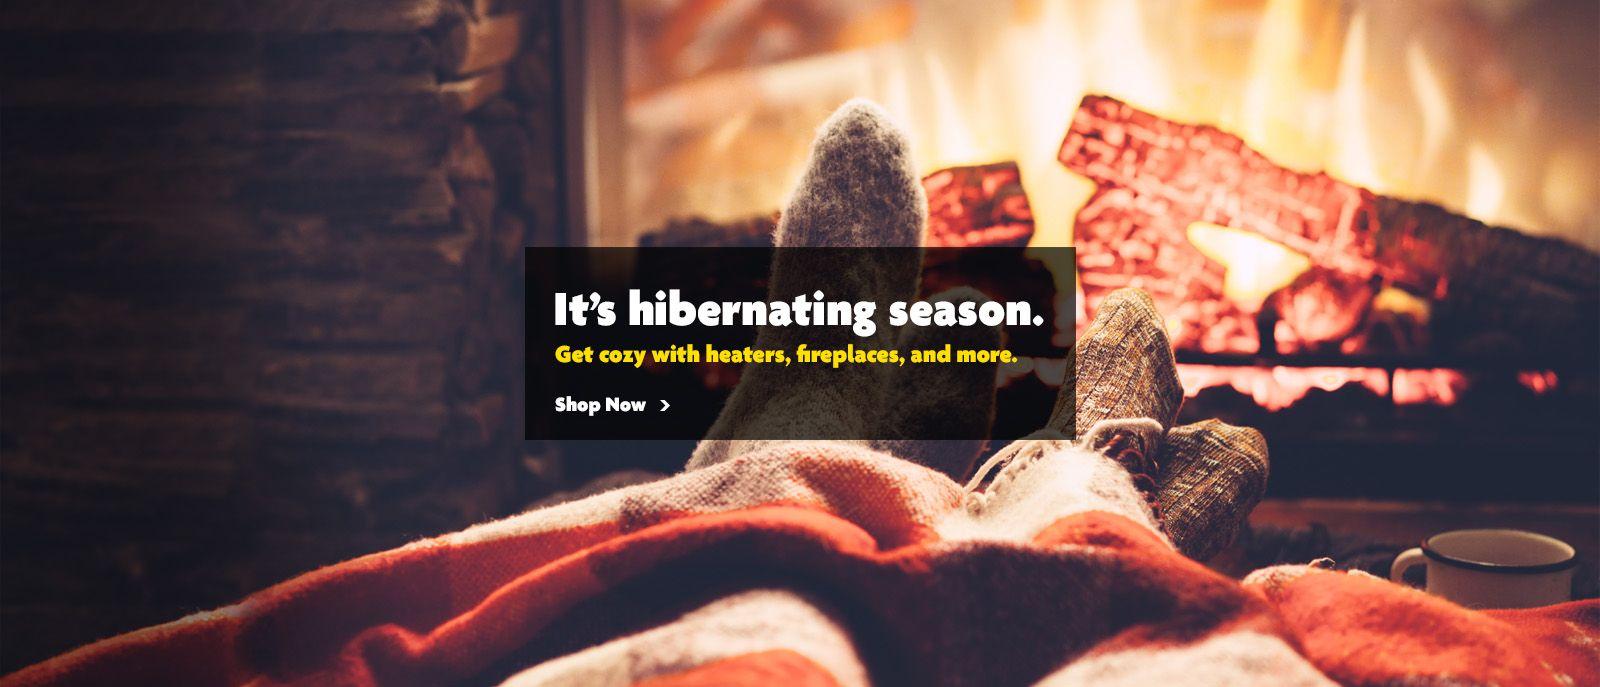 2019 Winter Hibernate Season Slider